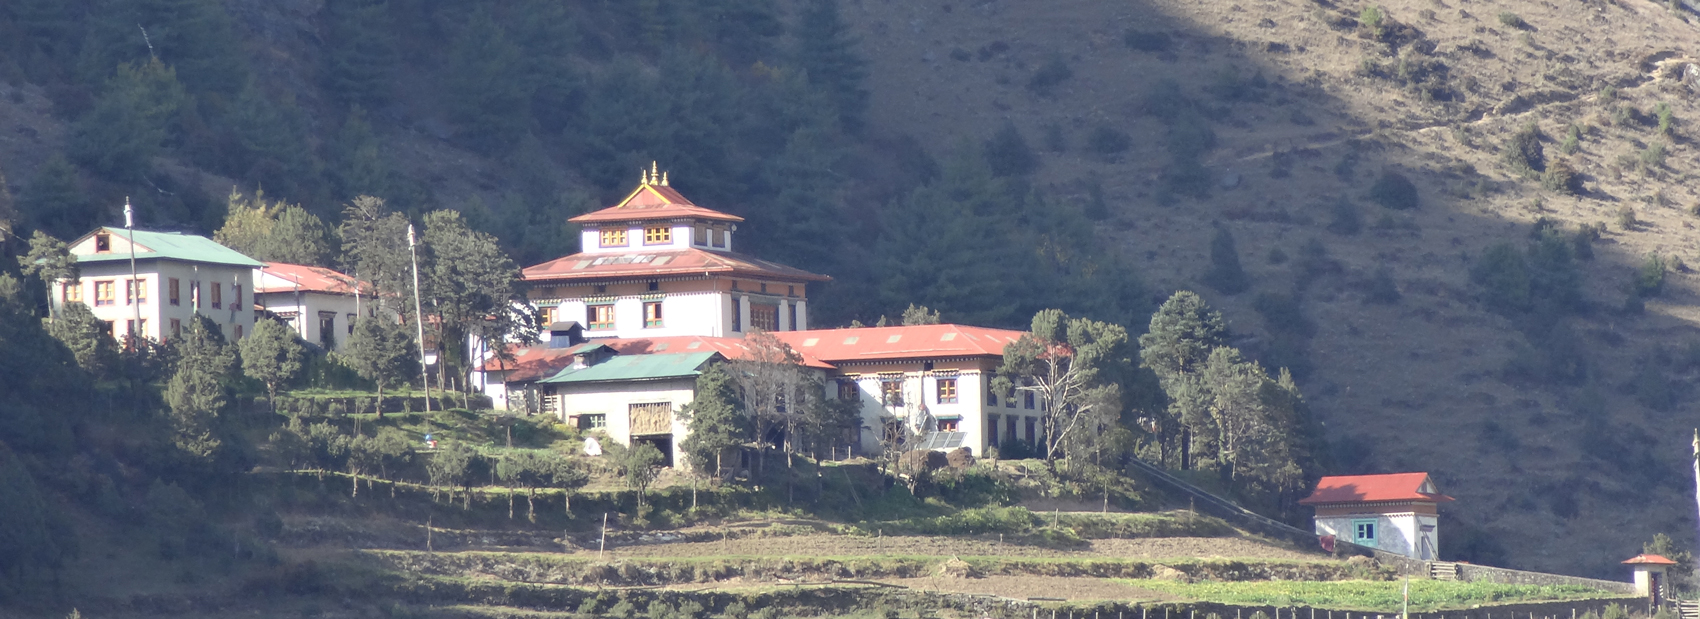 Kloster Serlo im Himalaya